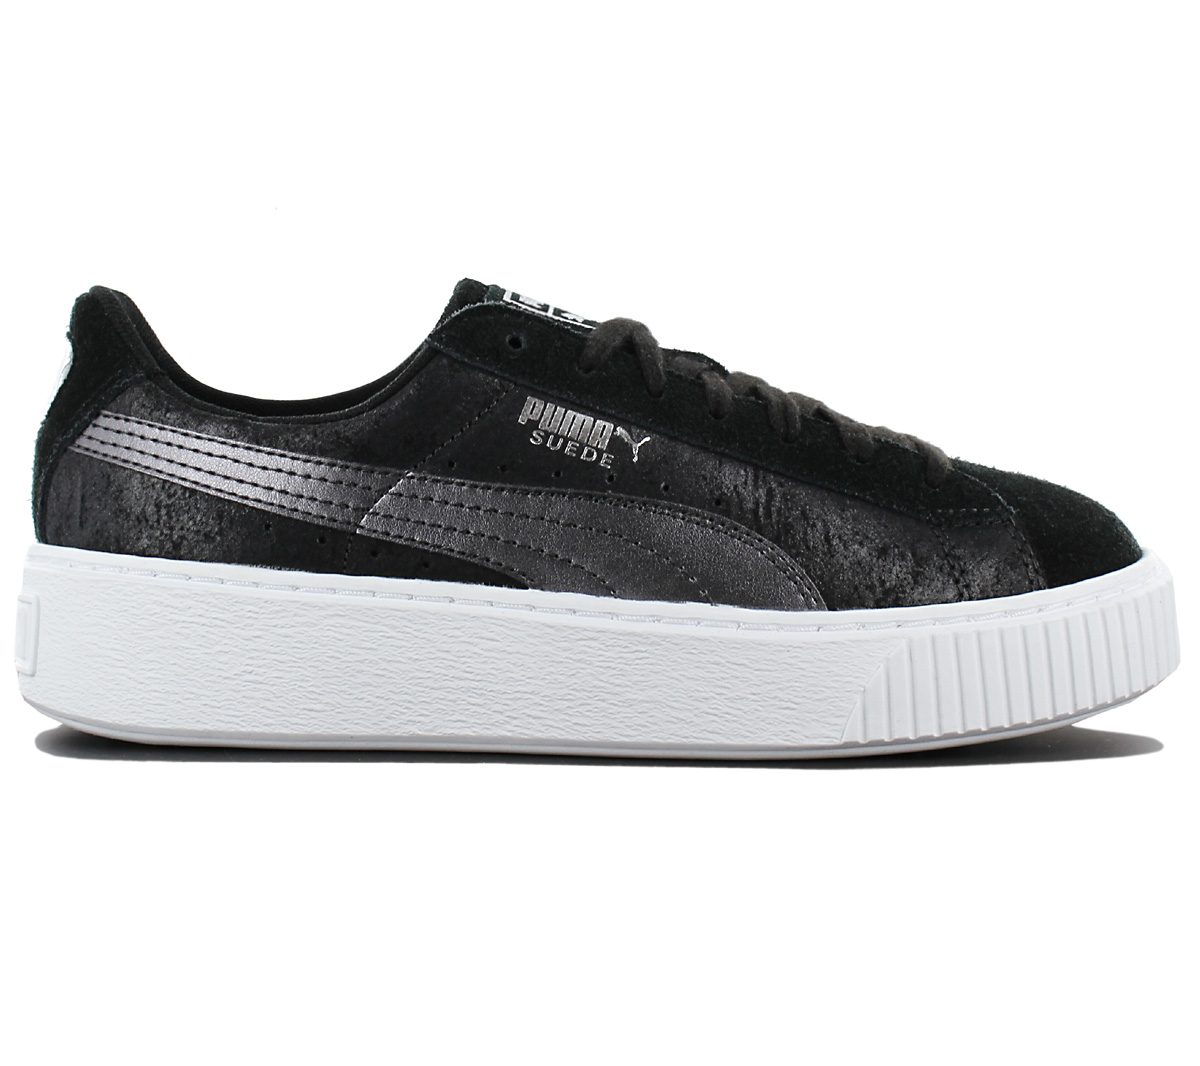 ee6b72bf502c Puma Suede Platform Safari Ladies Sneaker Shoes Leisure Leather ...